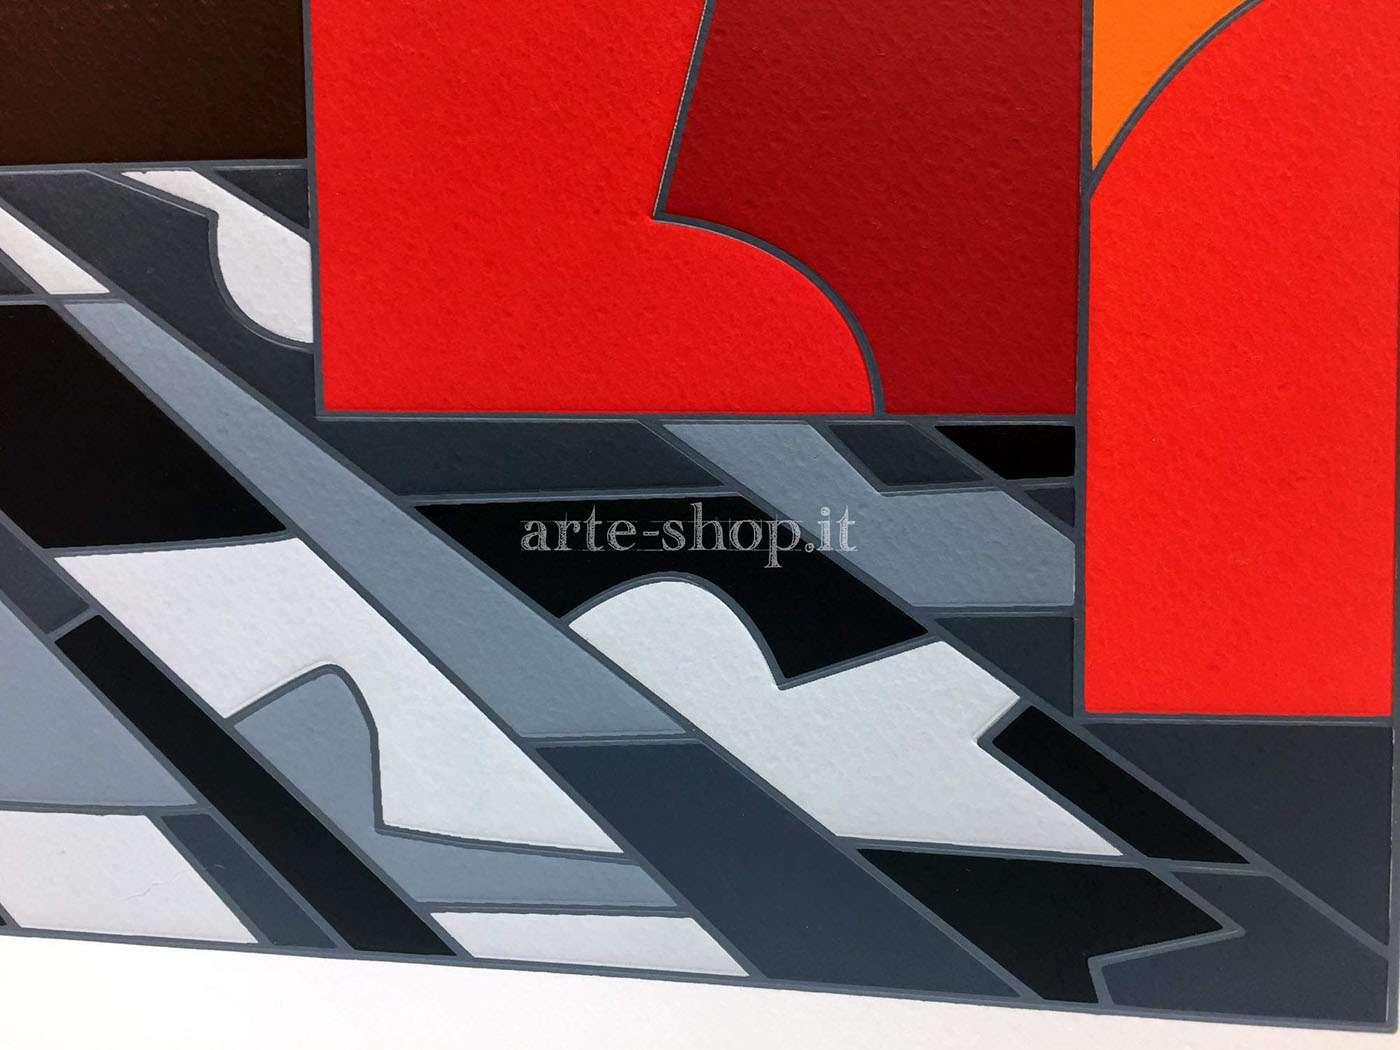 arte pentagono shop dettaglio numero 379